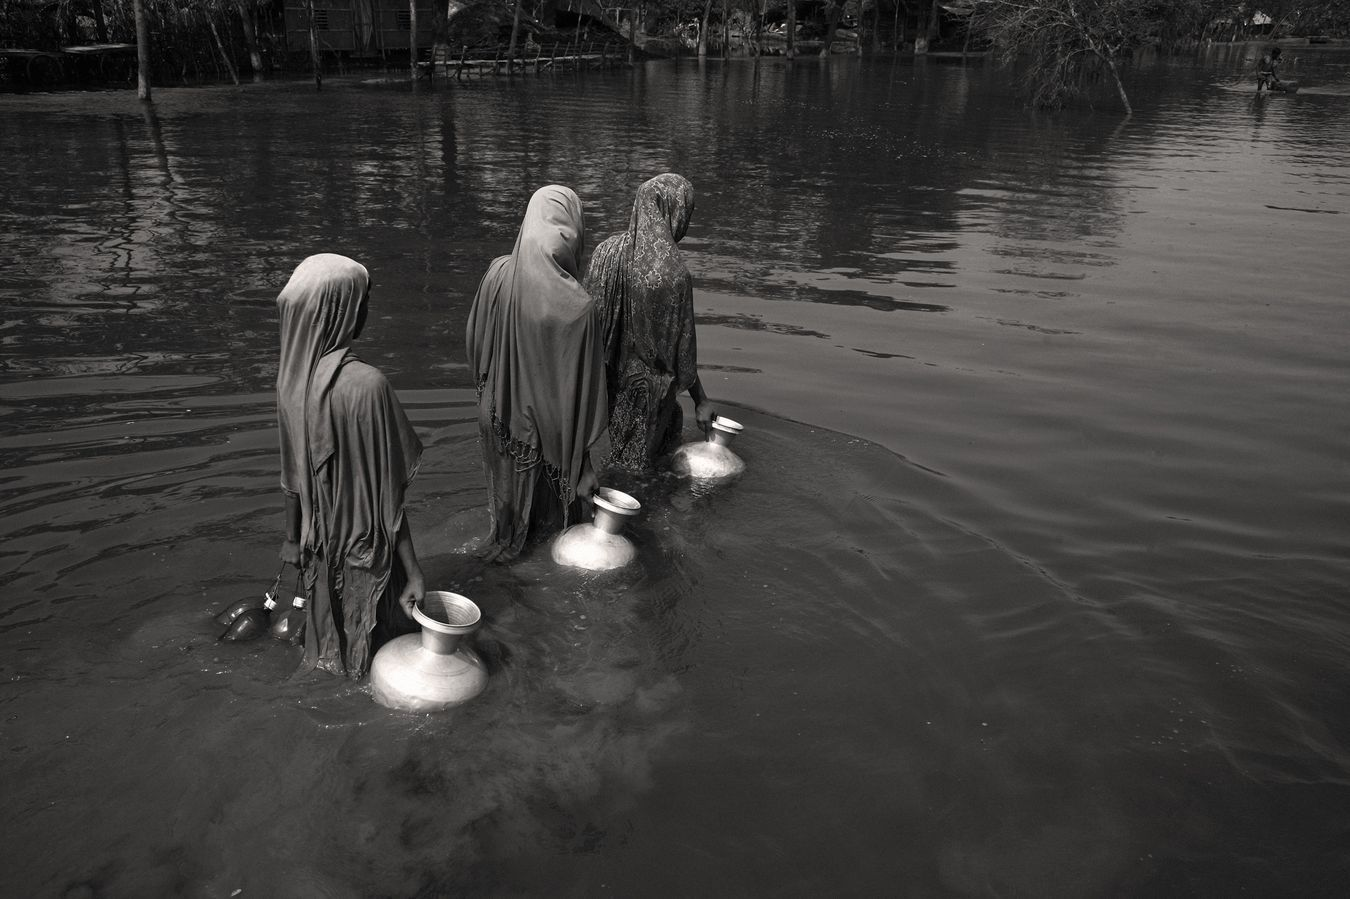 (4) Au Bangladesh, l'eau changée en sel - Libération